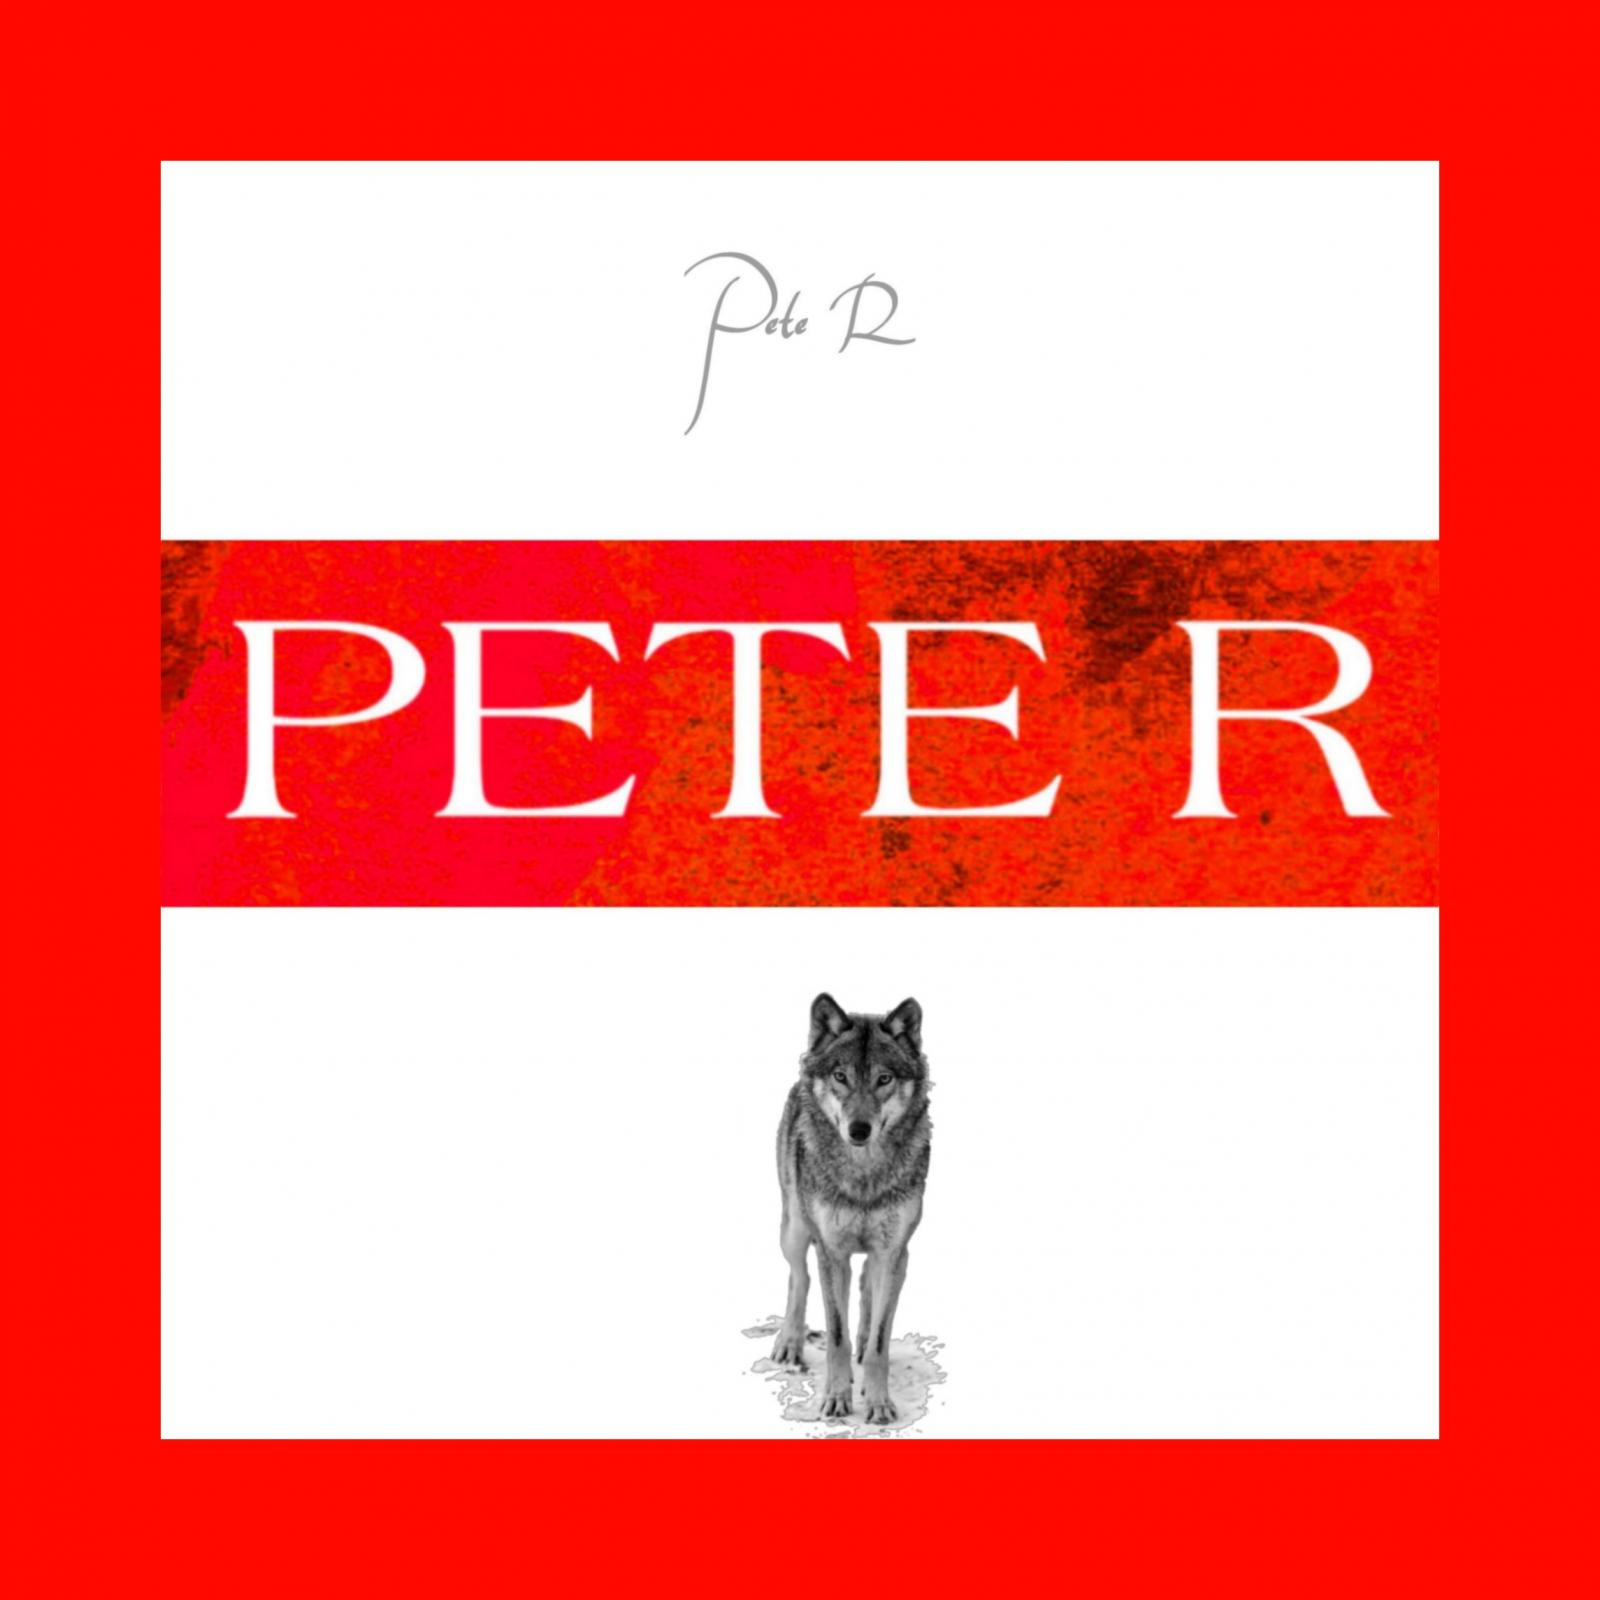 Upcoming: Pete R - Pete R